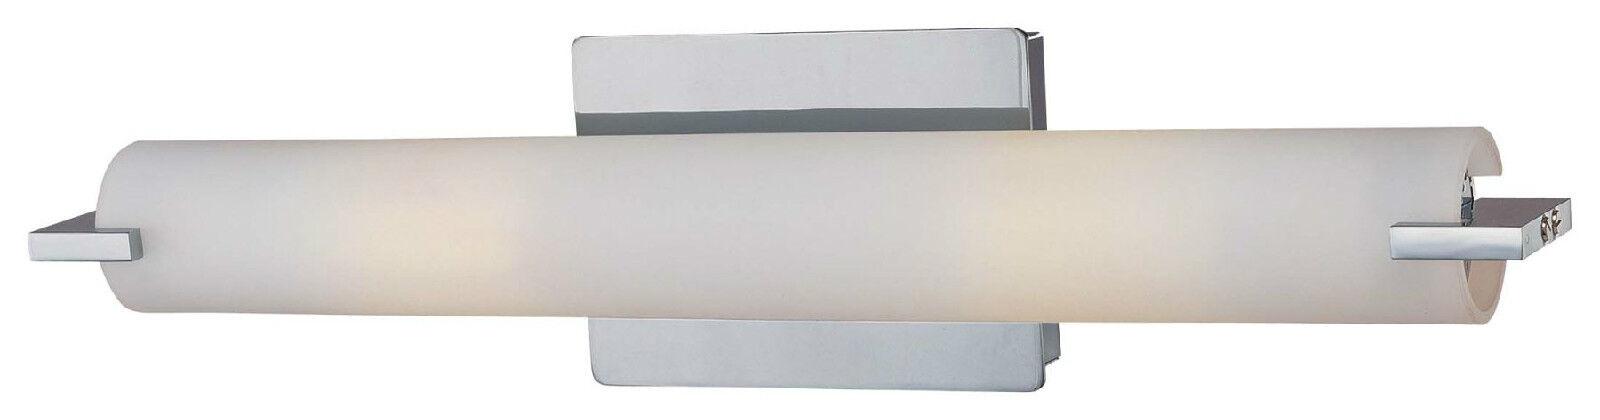 Elegant LED Bathroom Fixture Light Chrome Etched Glass Horizontal Grünical NEW